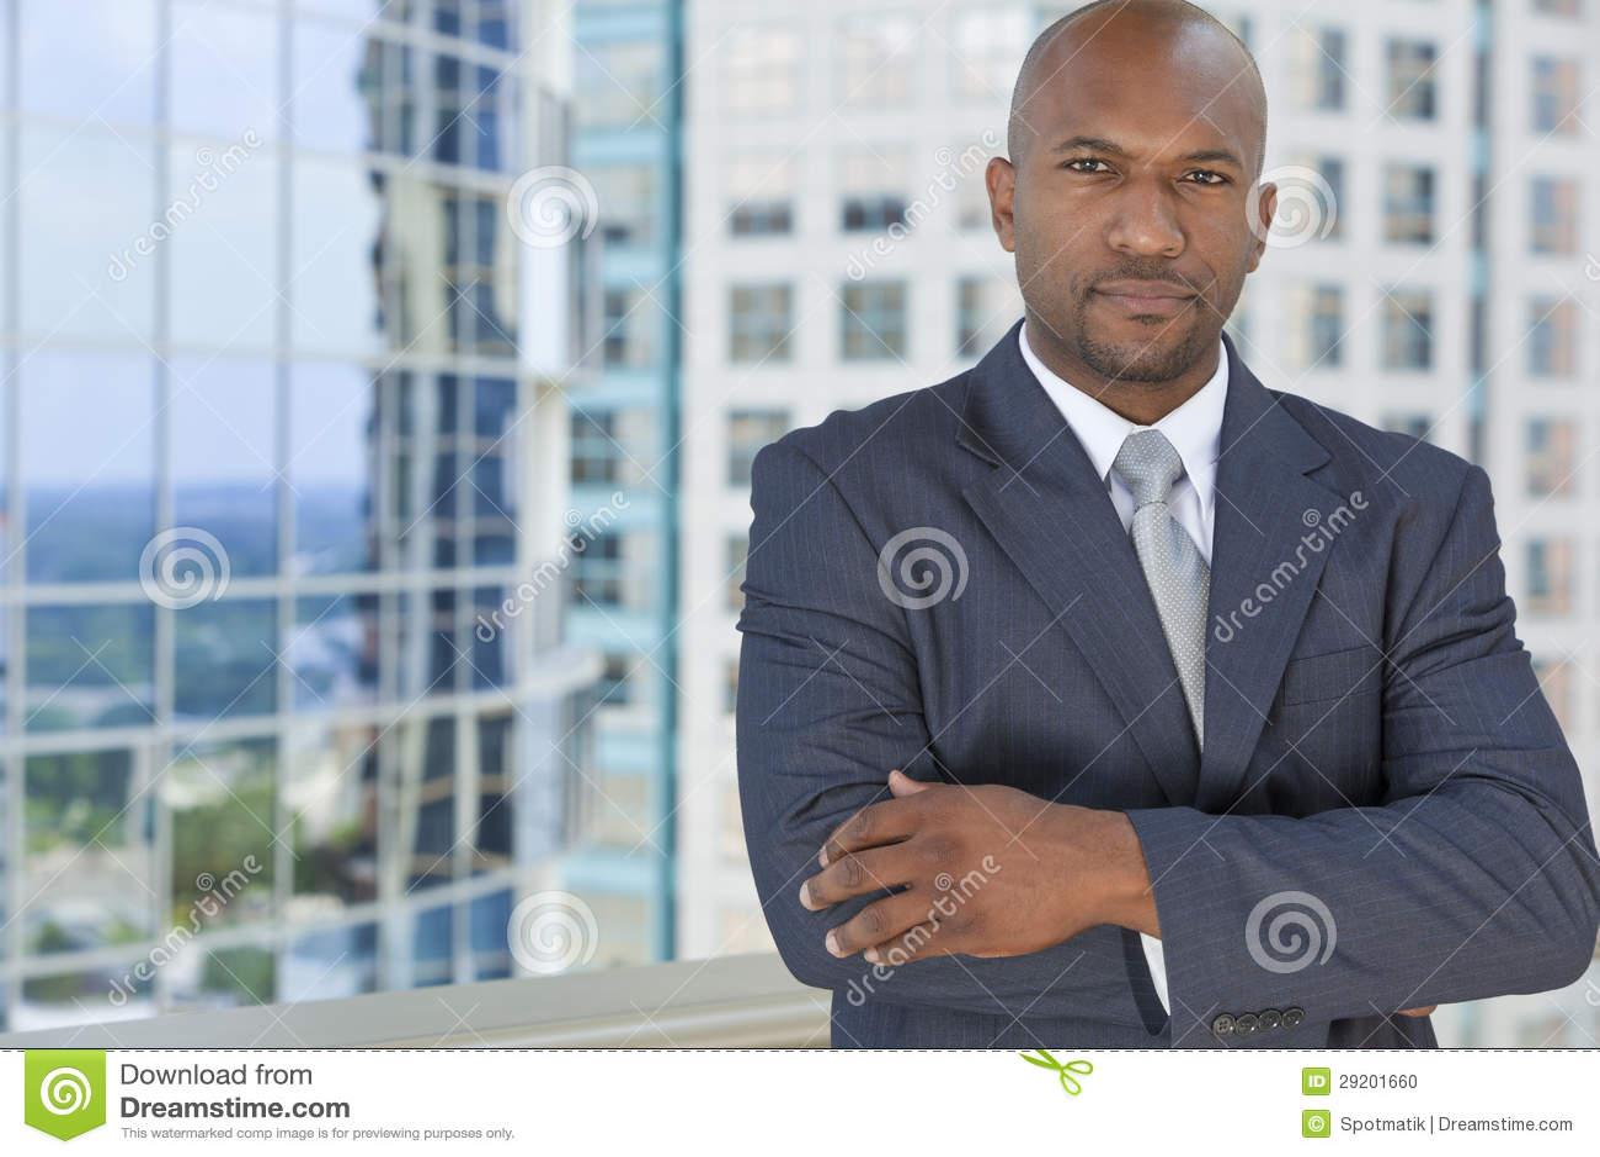 Successful African American Man or Businessman